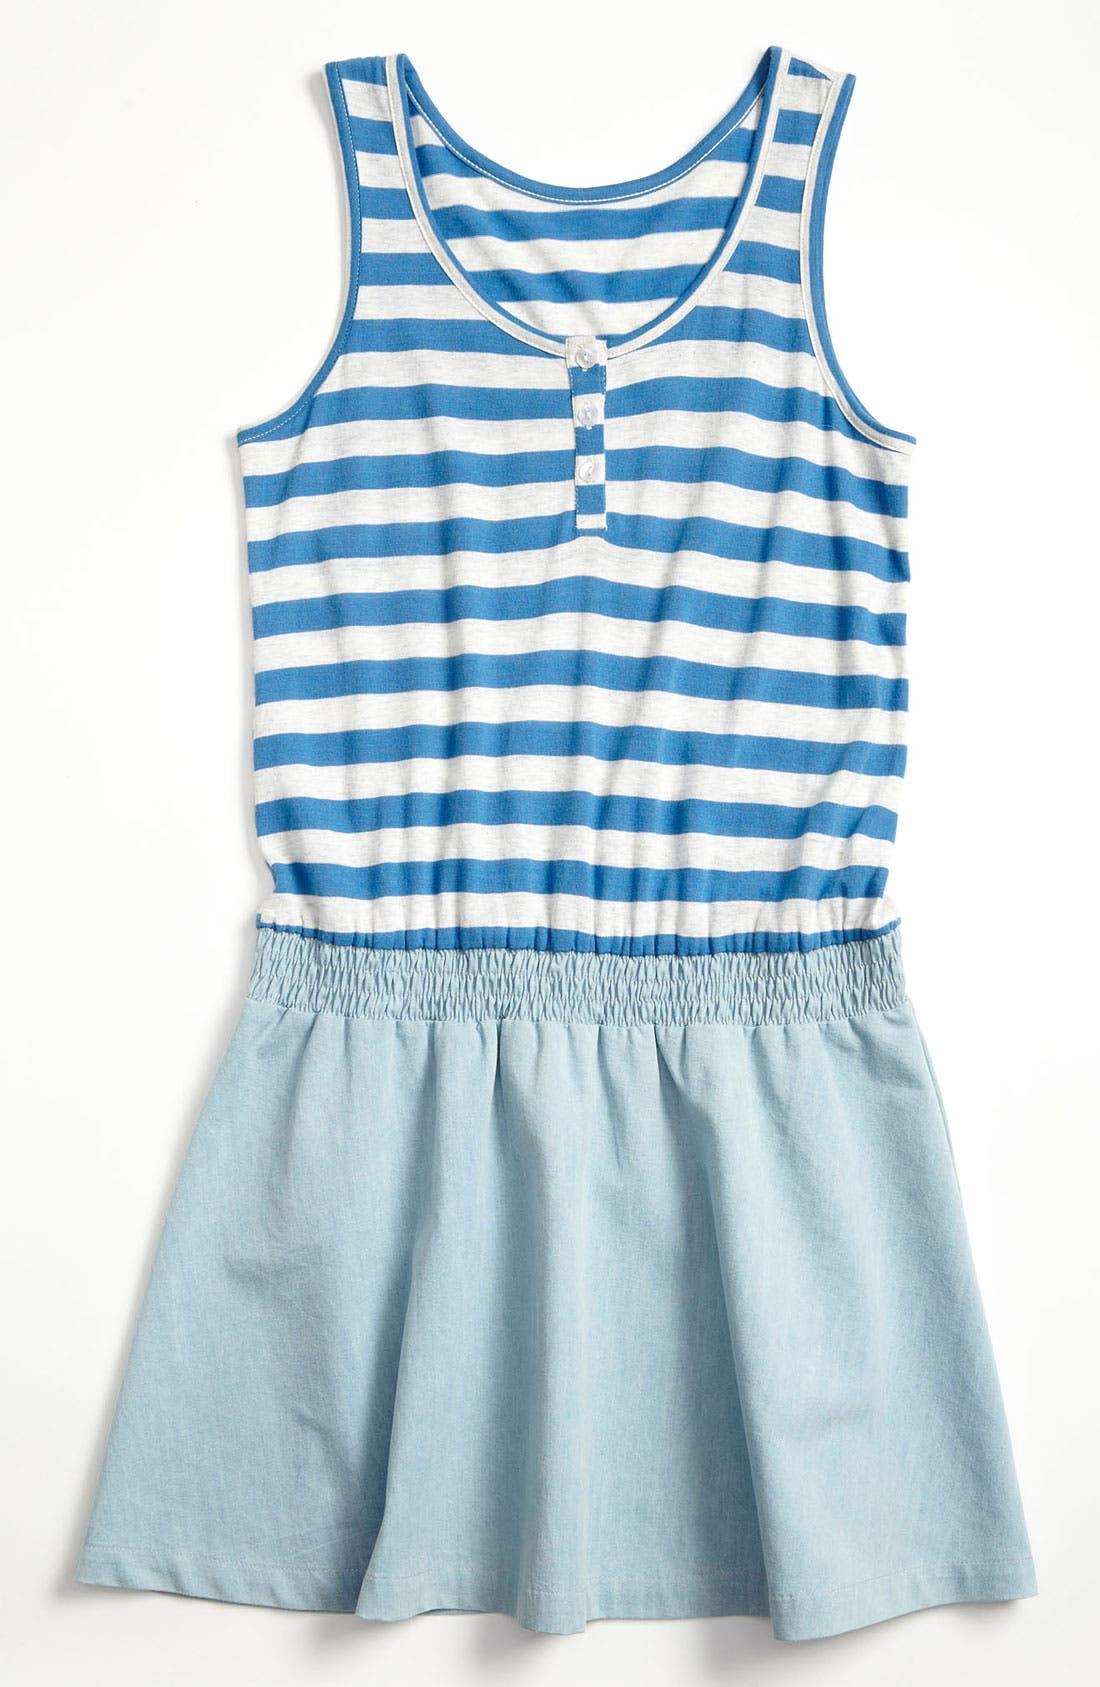 Main Image - Tucker + Tate 'Julia' Knit Dress (Big Girls)